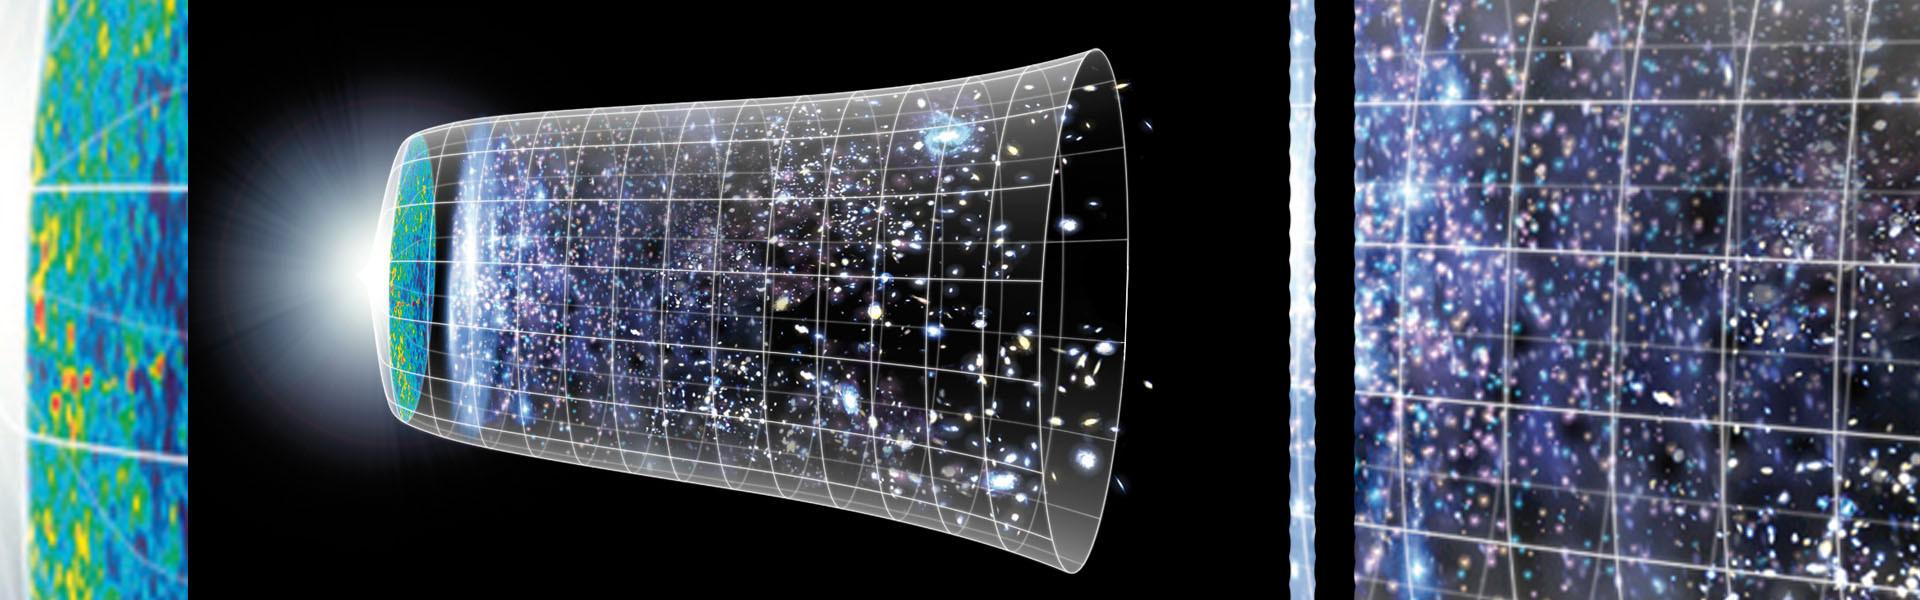 Kosmologische Horizonte